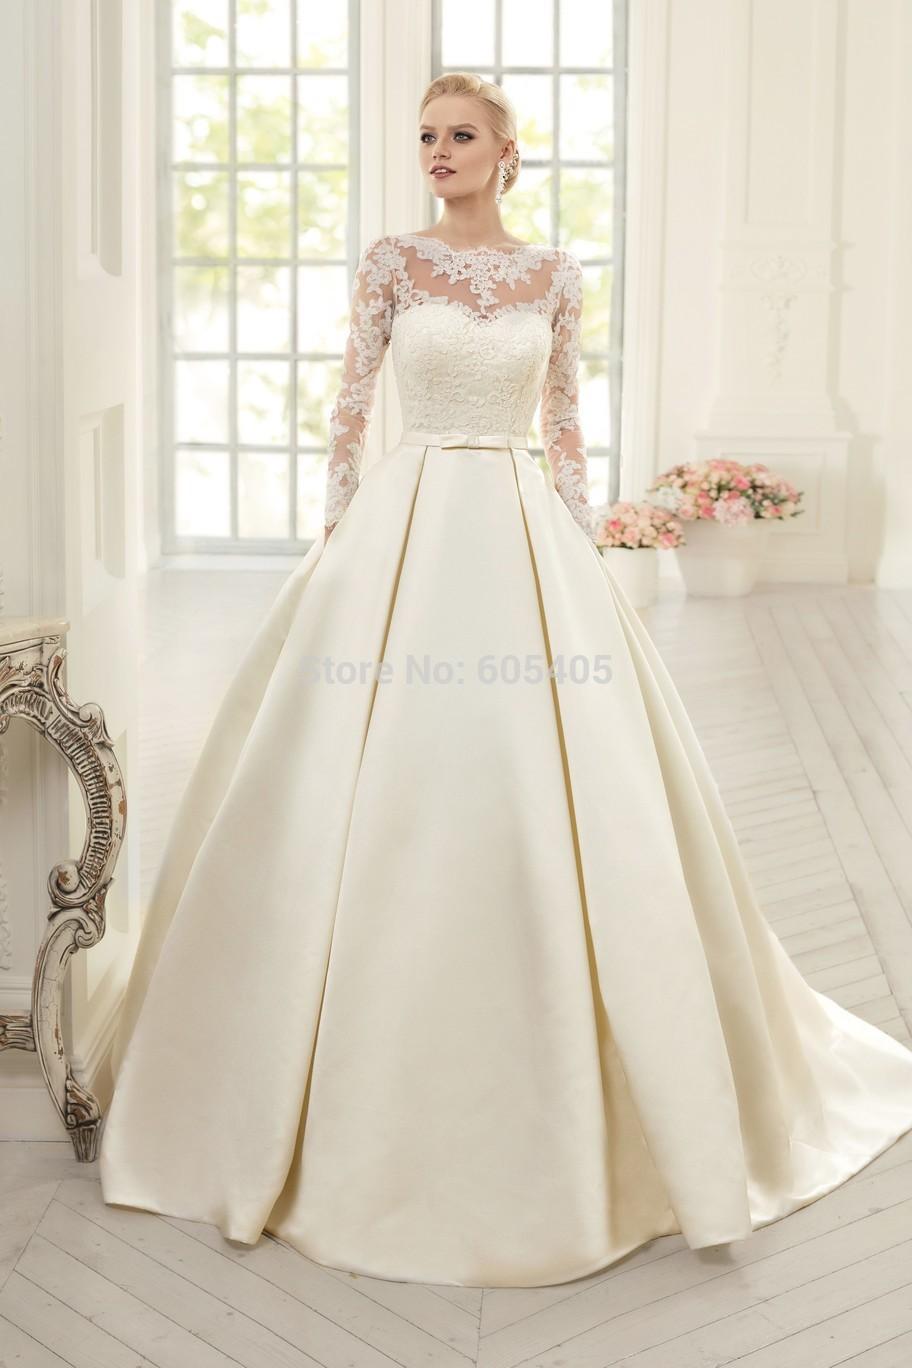 Satin Long Sleeve Wedding Dresses 2015